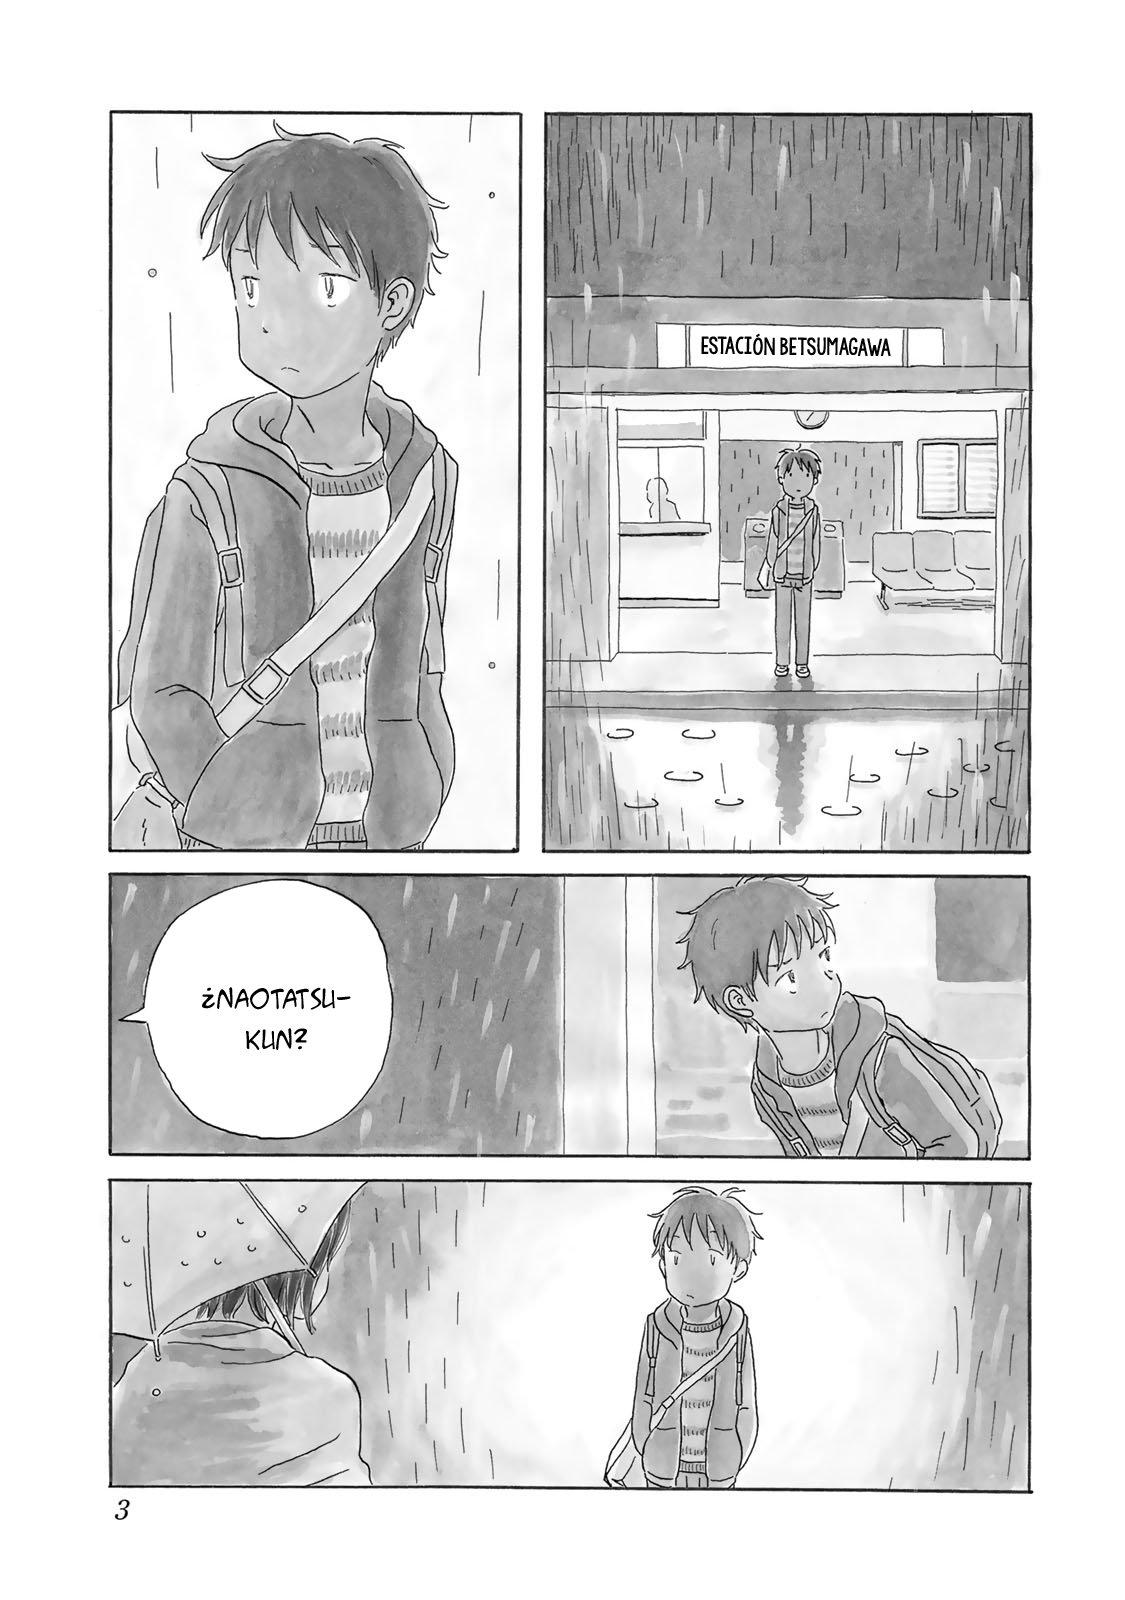 https://nine.mangadogs.com/es_manga/pic8/50/36658/946317/21284d06d37f8fd0173be836eb3ee15d.jpg Page 4